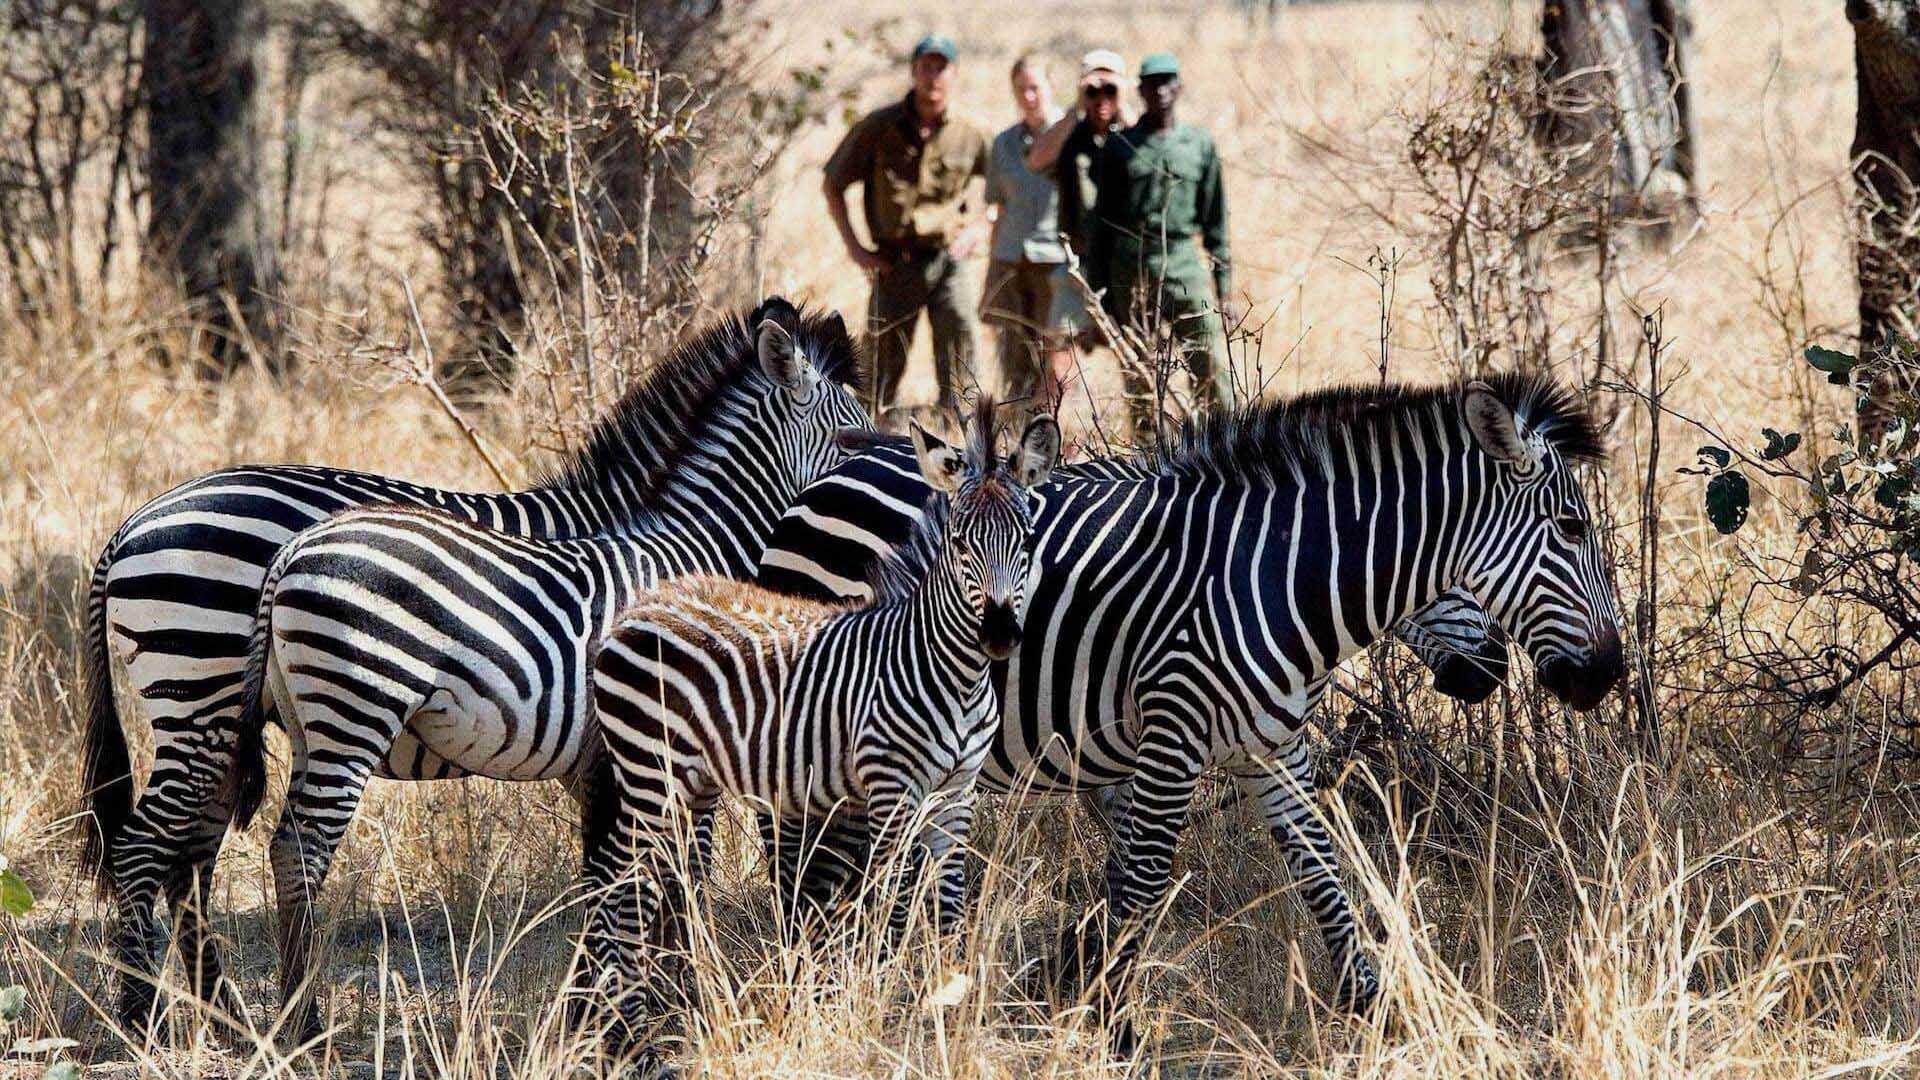 flatdogs camp zambia-lodges-beach-bush-zambia-in-style-tours-safari-packages-safaris-adventures-ocean-travel-wildlife-africa